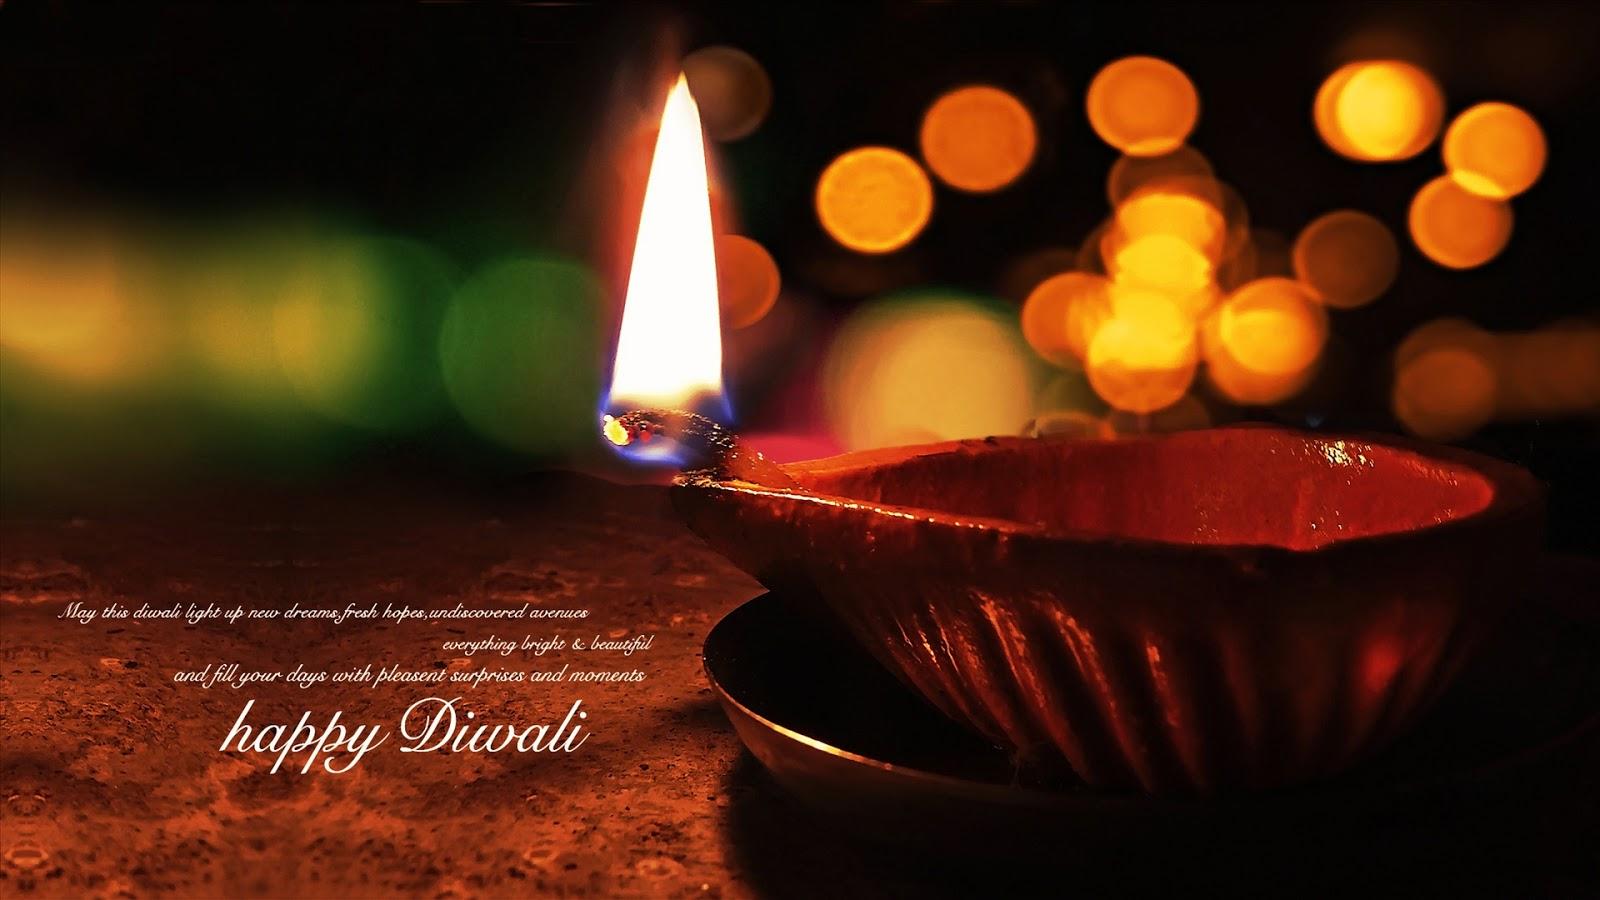 High Resolution Diwali Wallpapers: Indian's Most Beautiful Festiwal